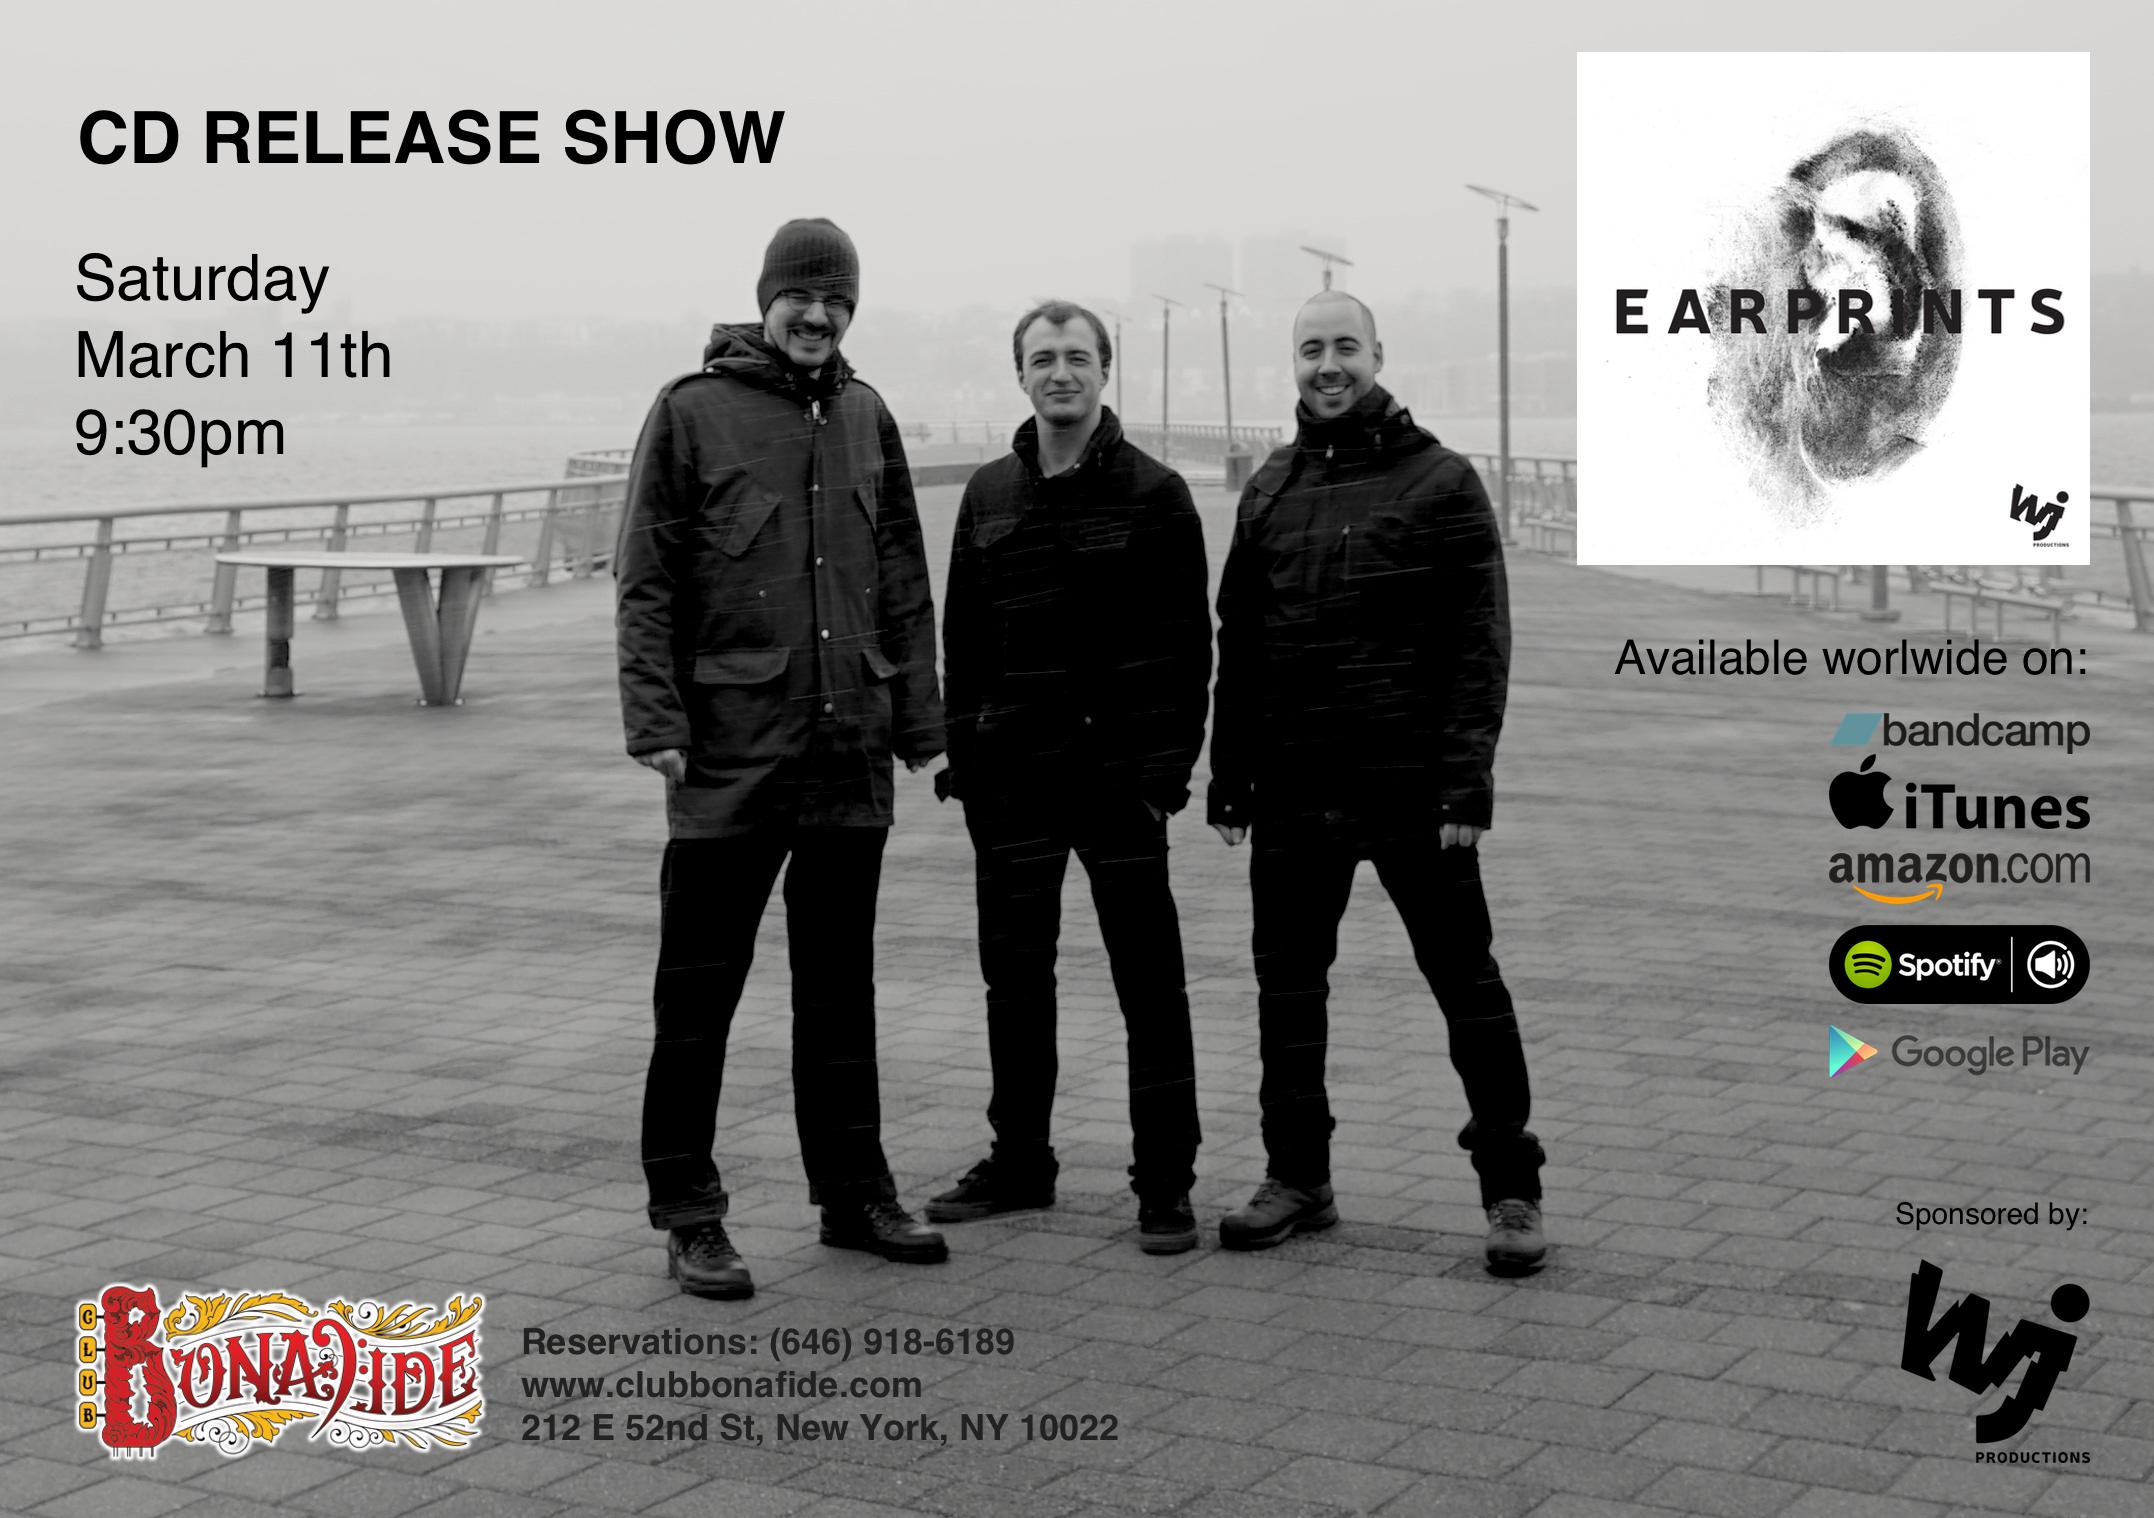 EARPRINTS cd release show.jpg